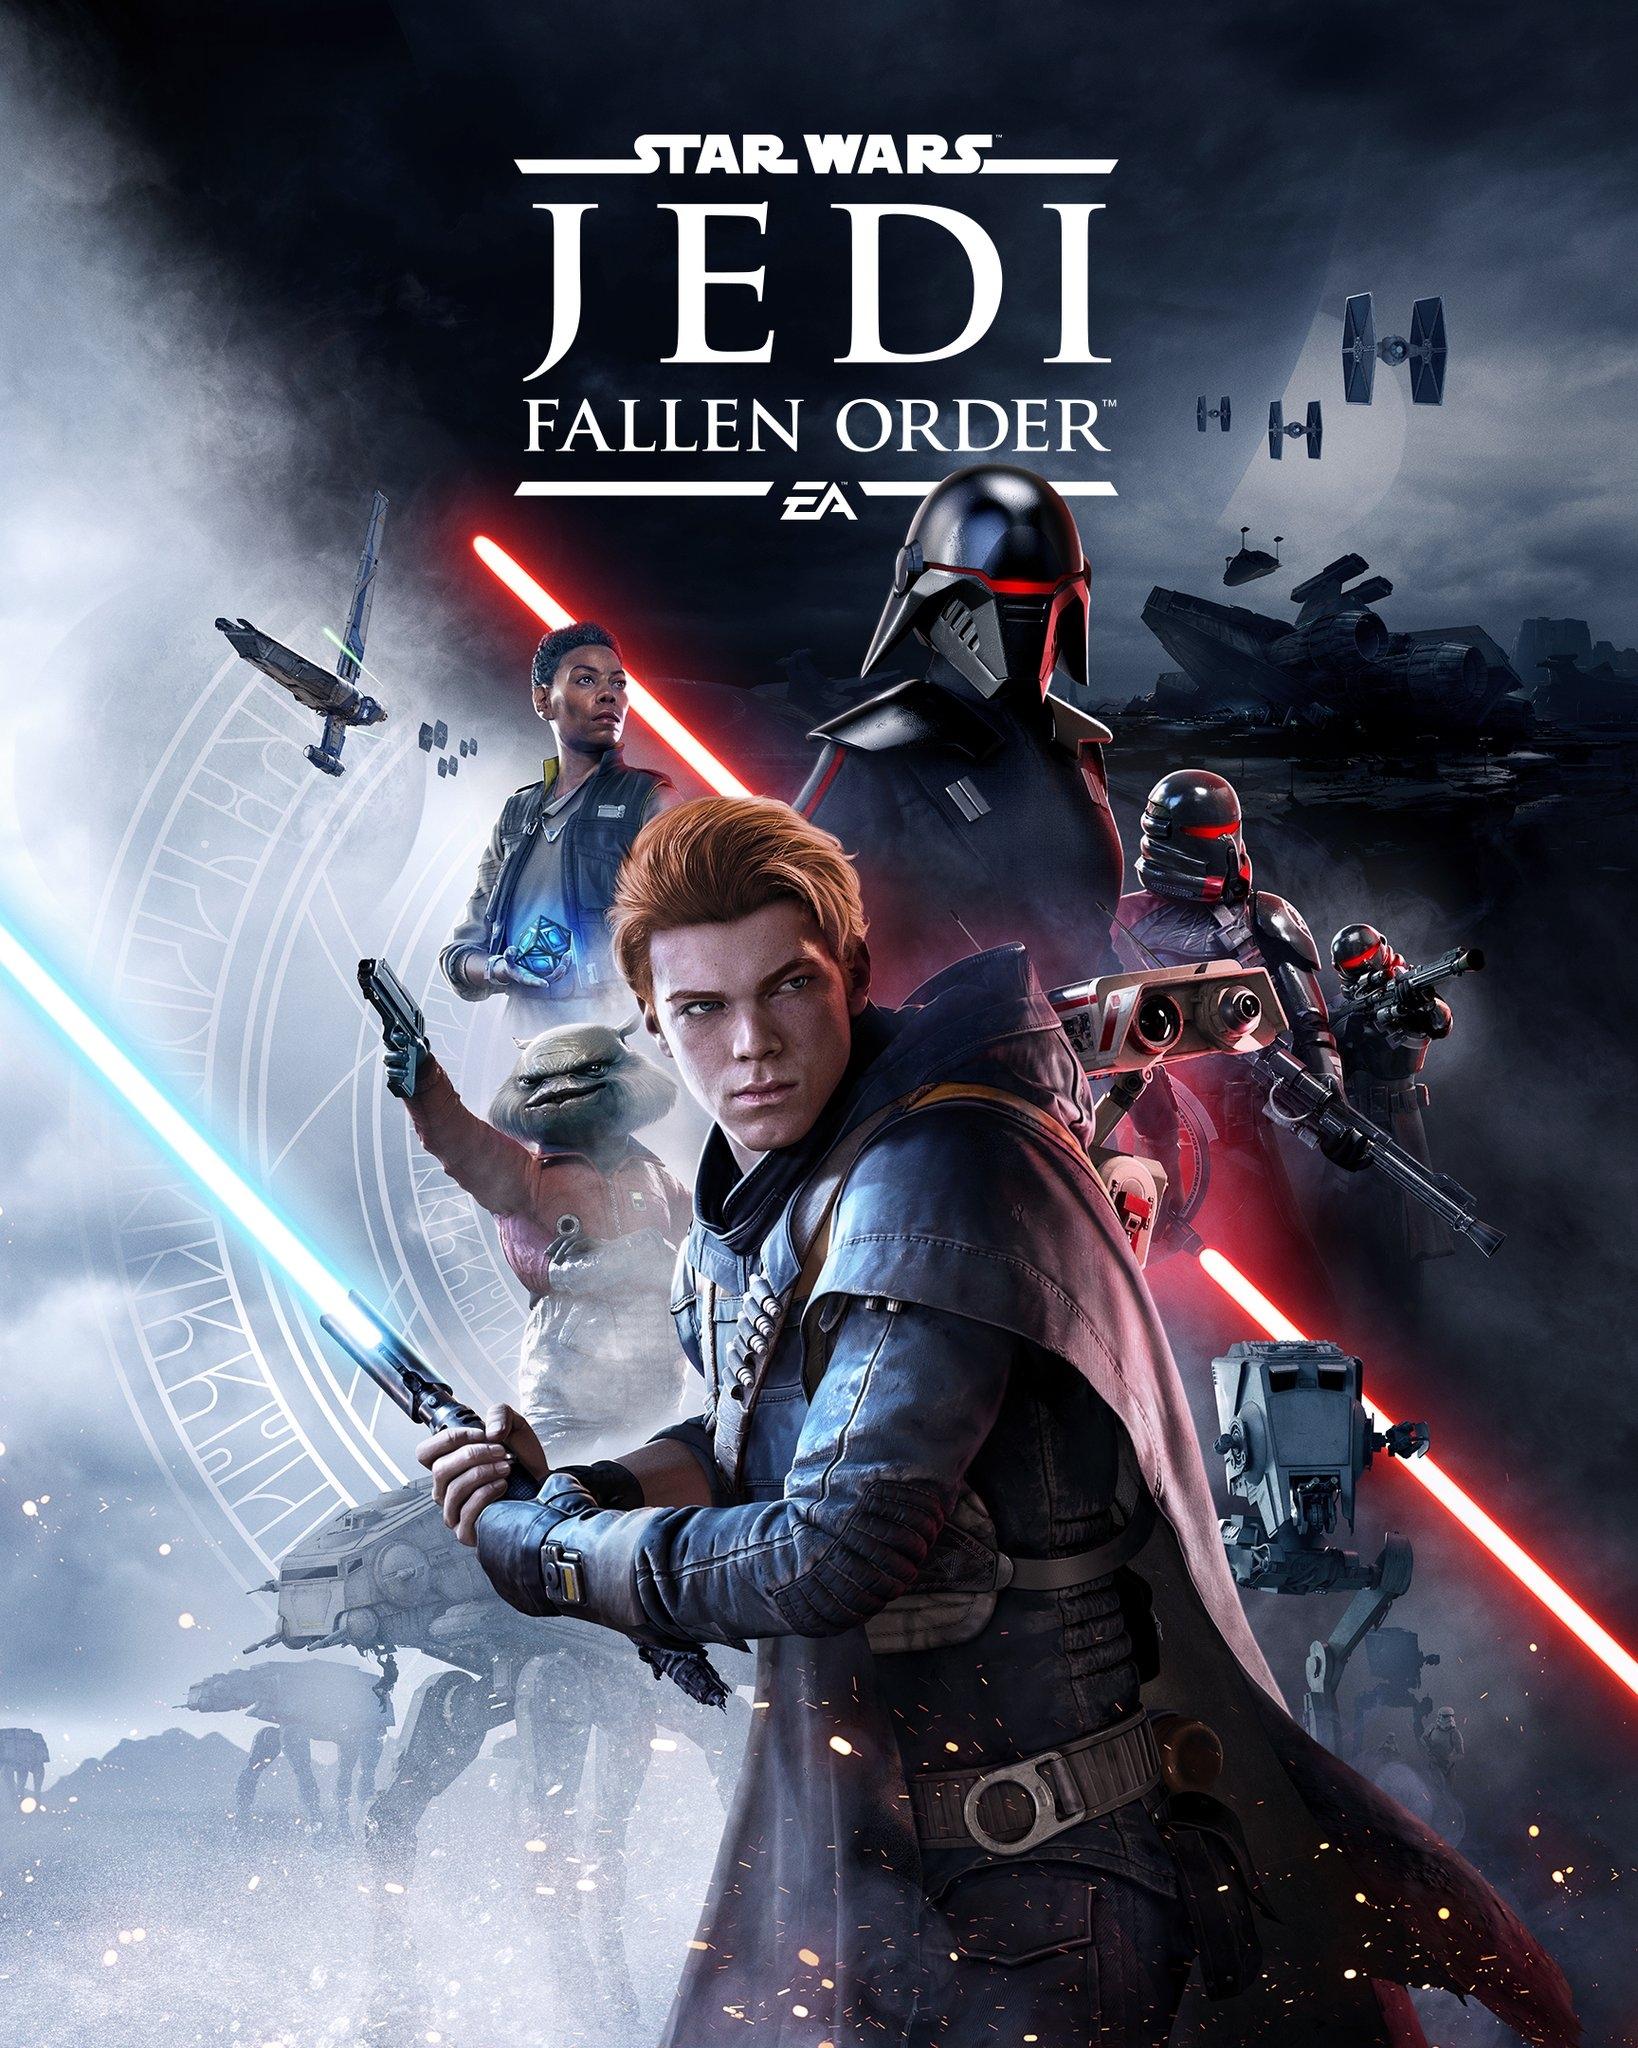 Star Wars-Jedi Warriors 4-pack